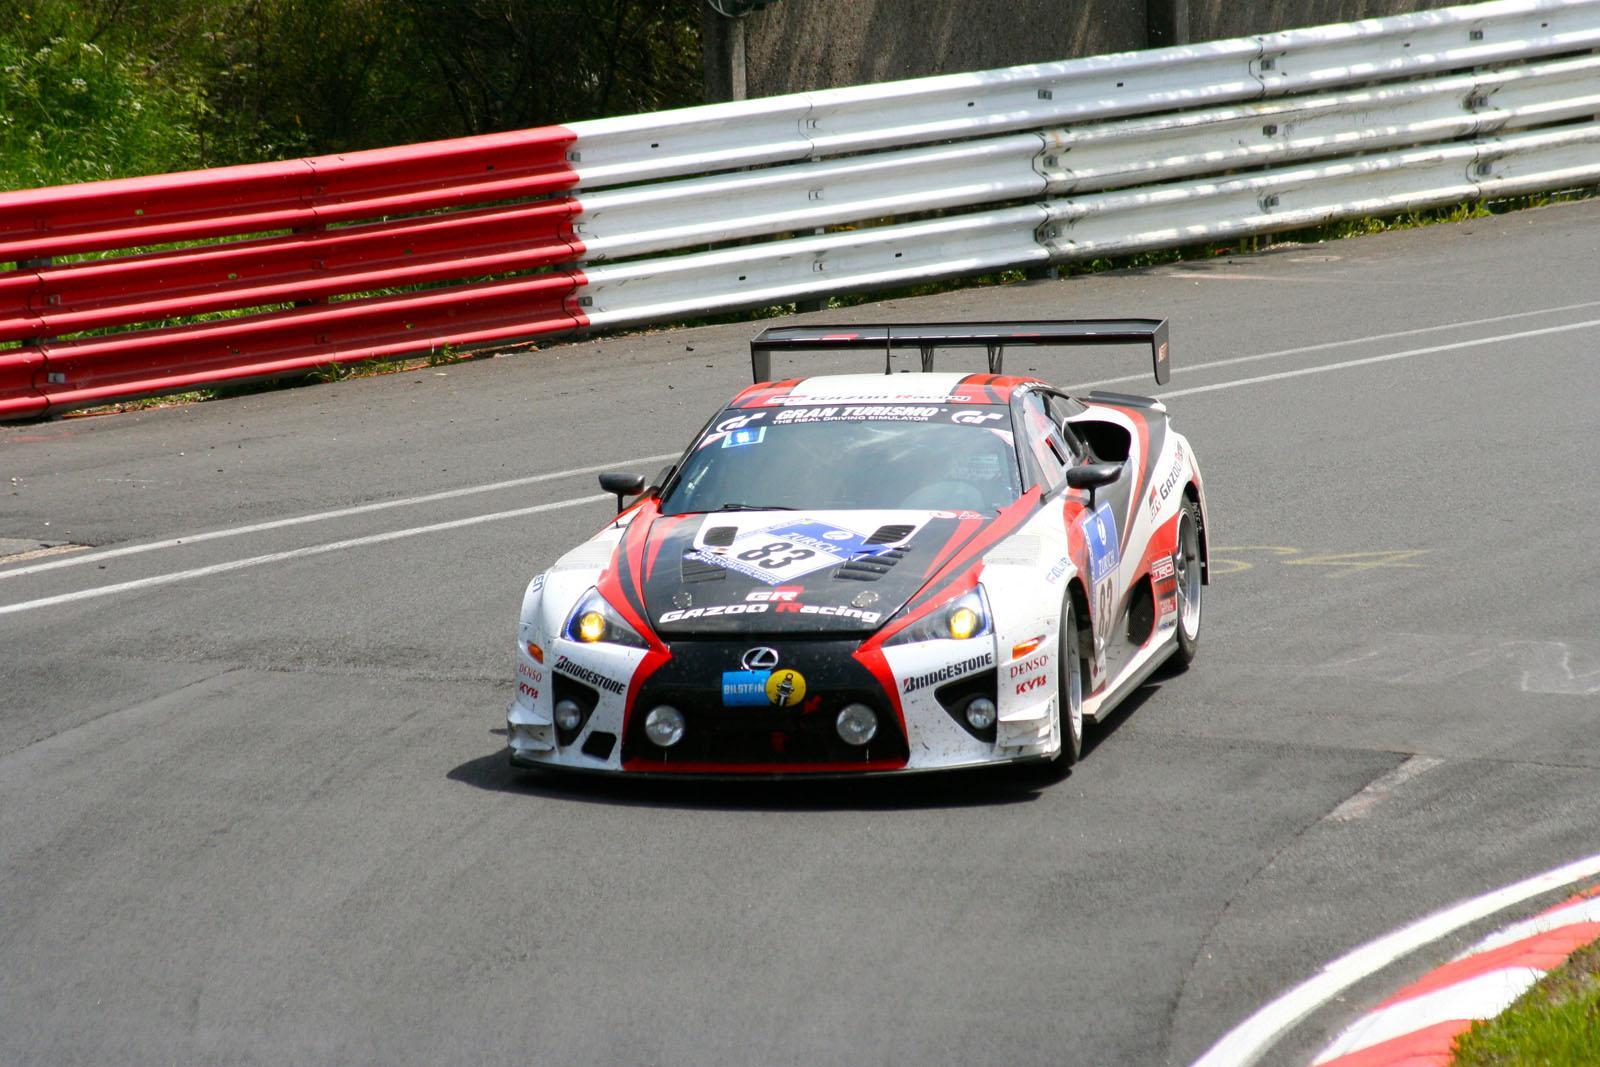 2012 Nurburgring 24 Hours Lexus Lfa